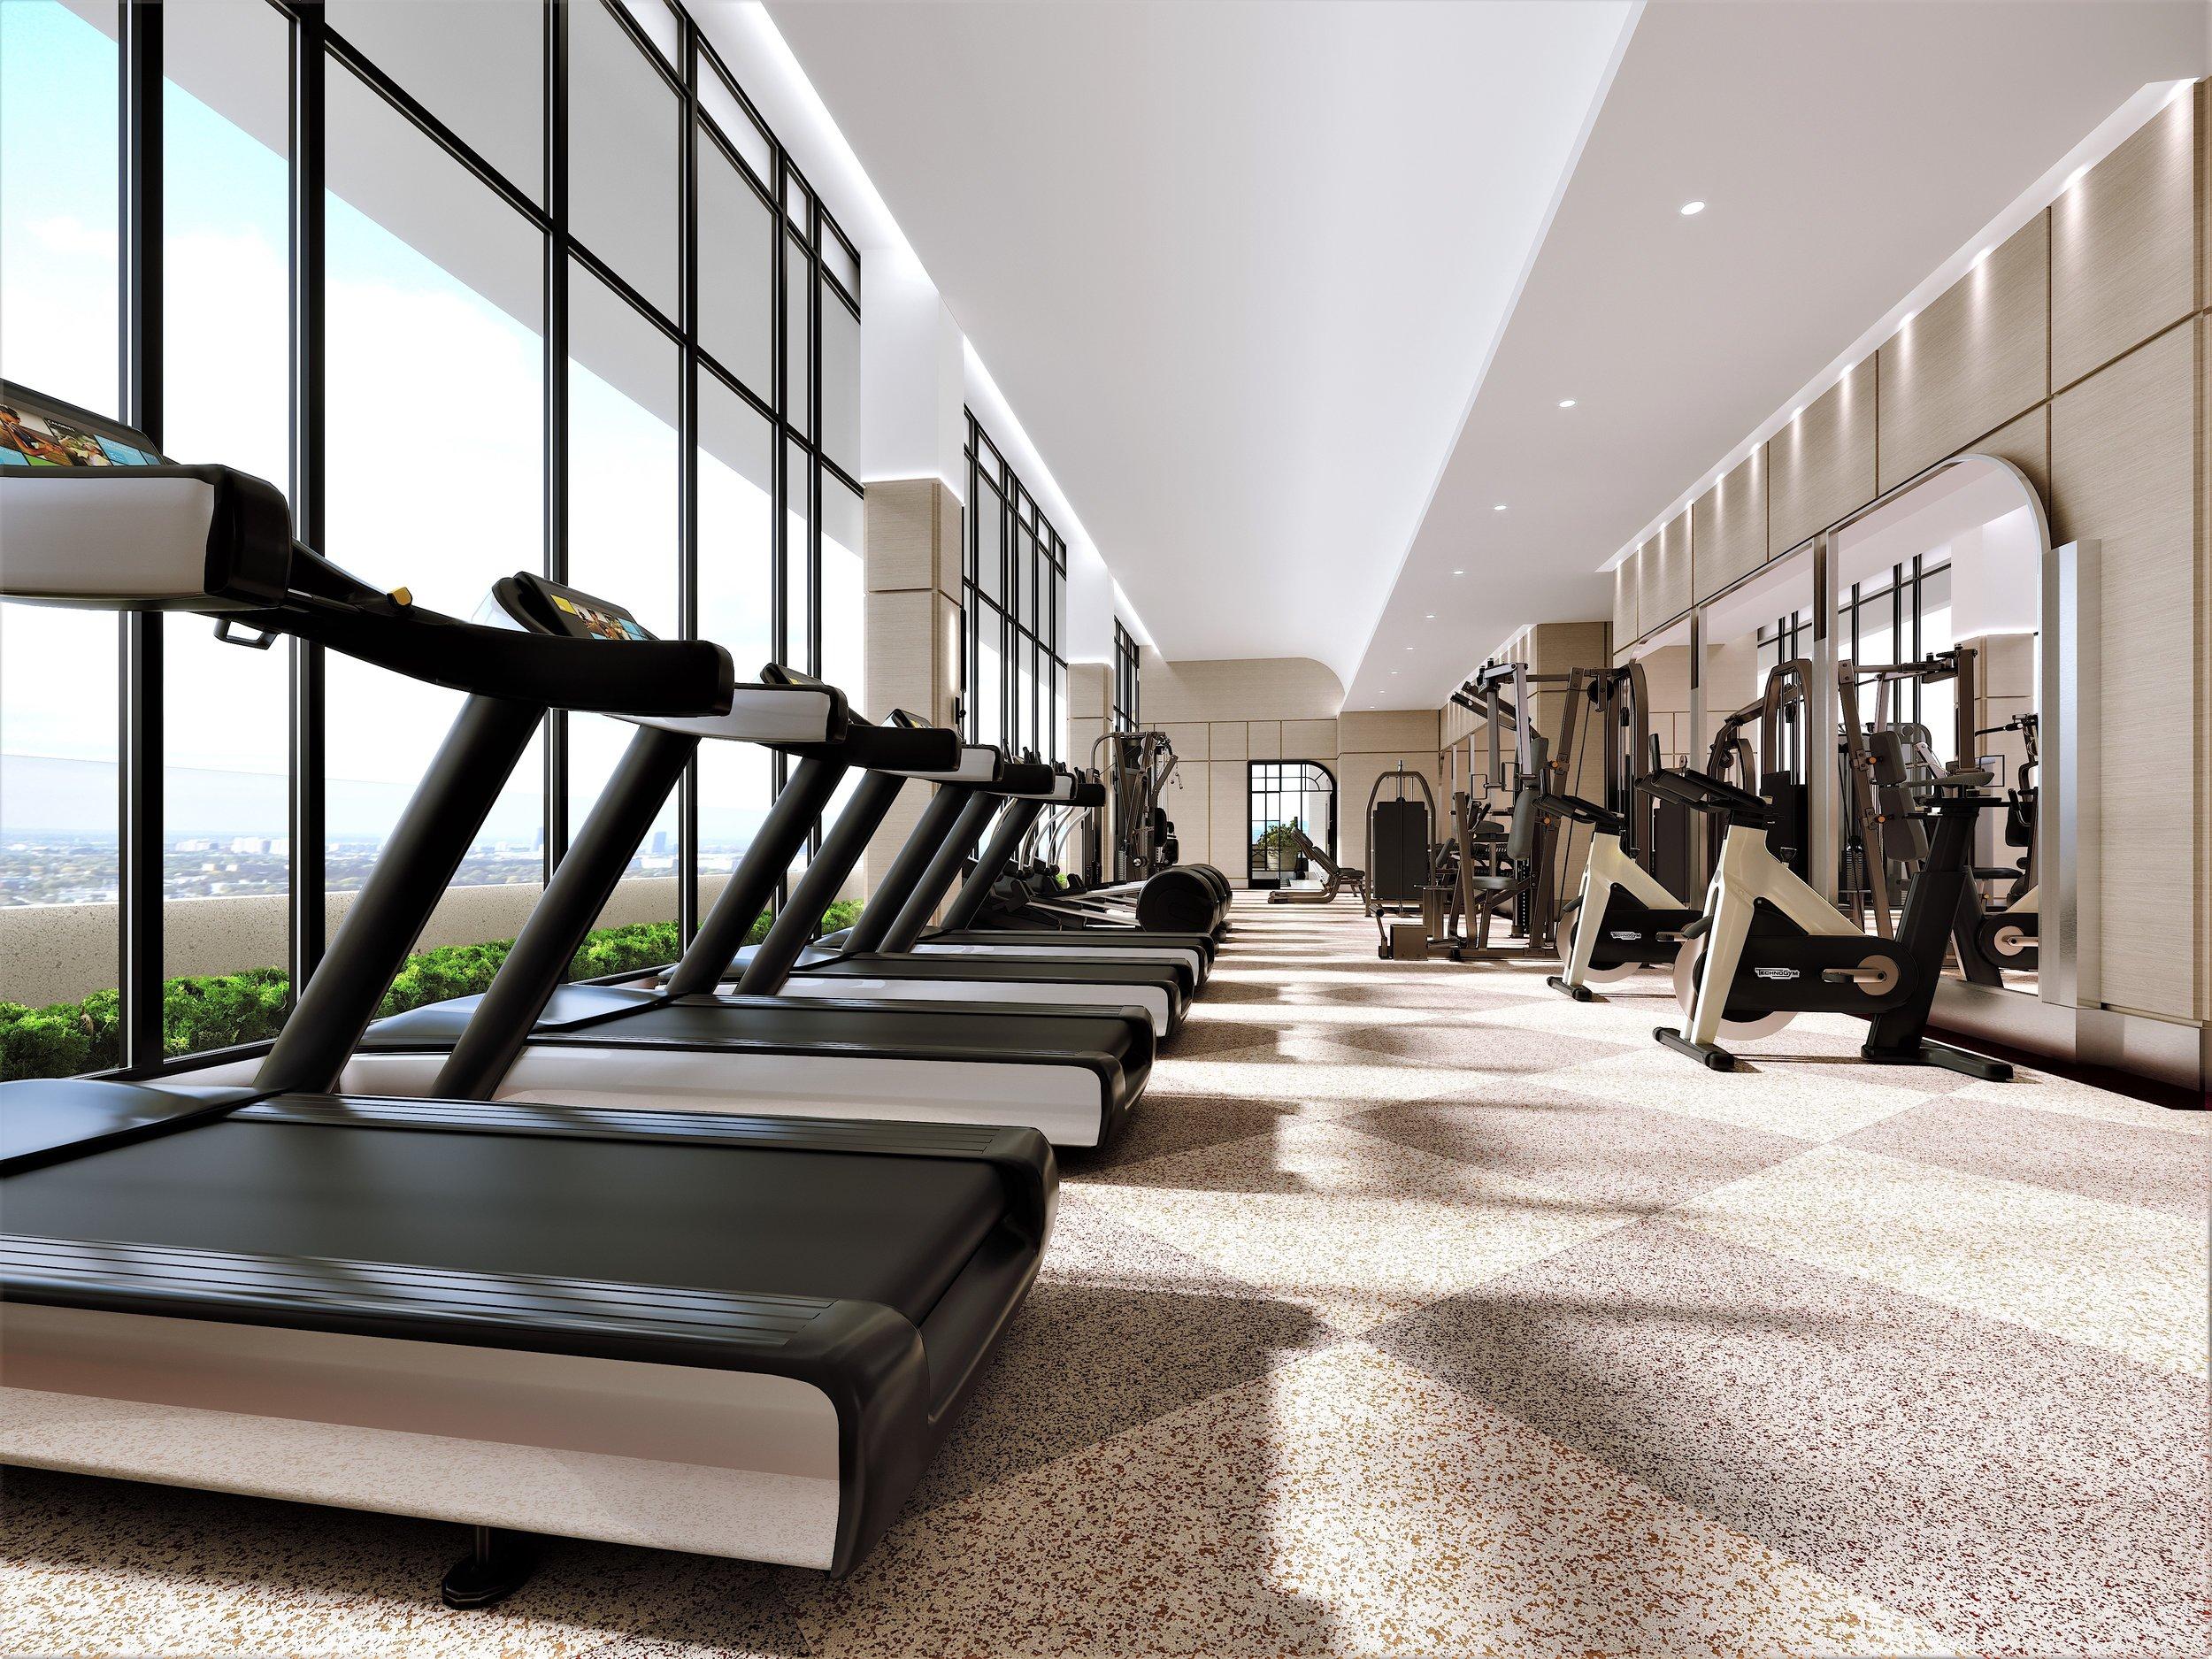 gym_Fitness 009.0000.jpg